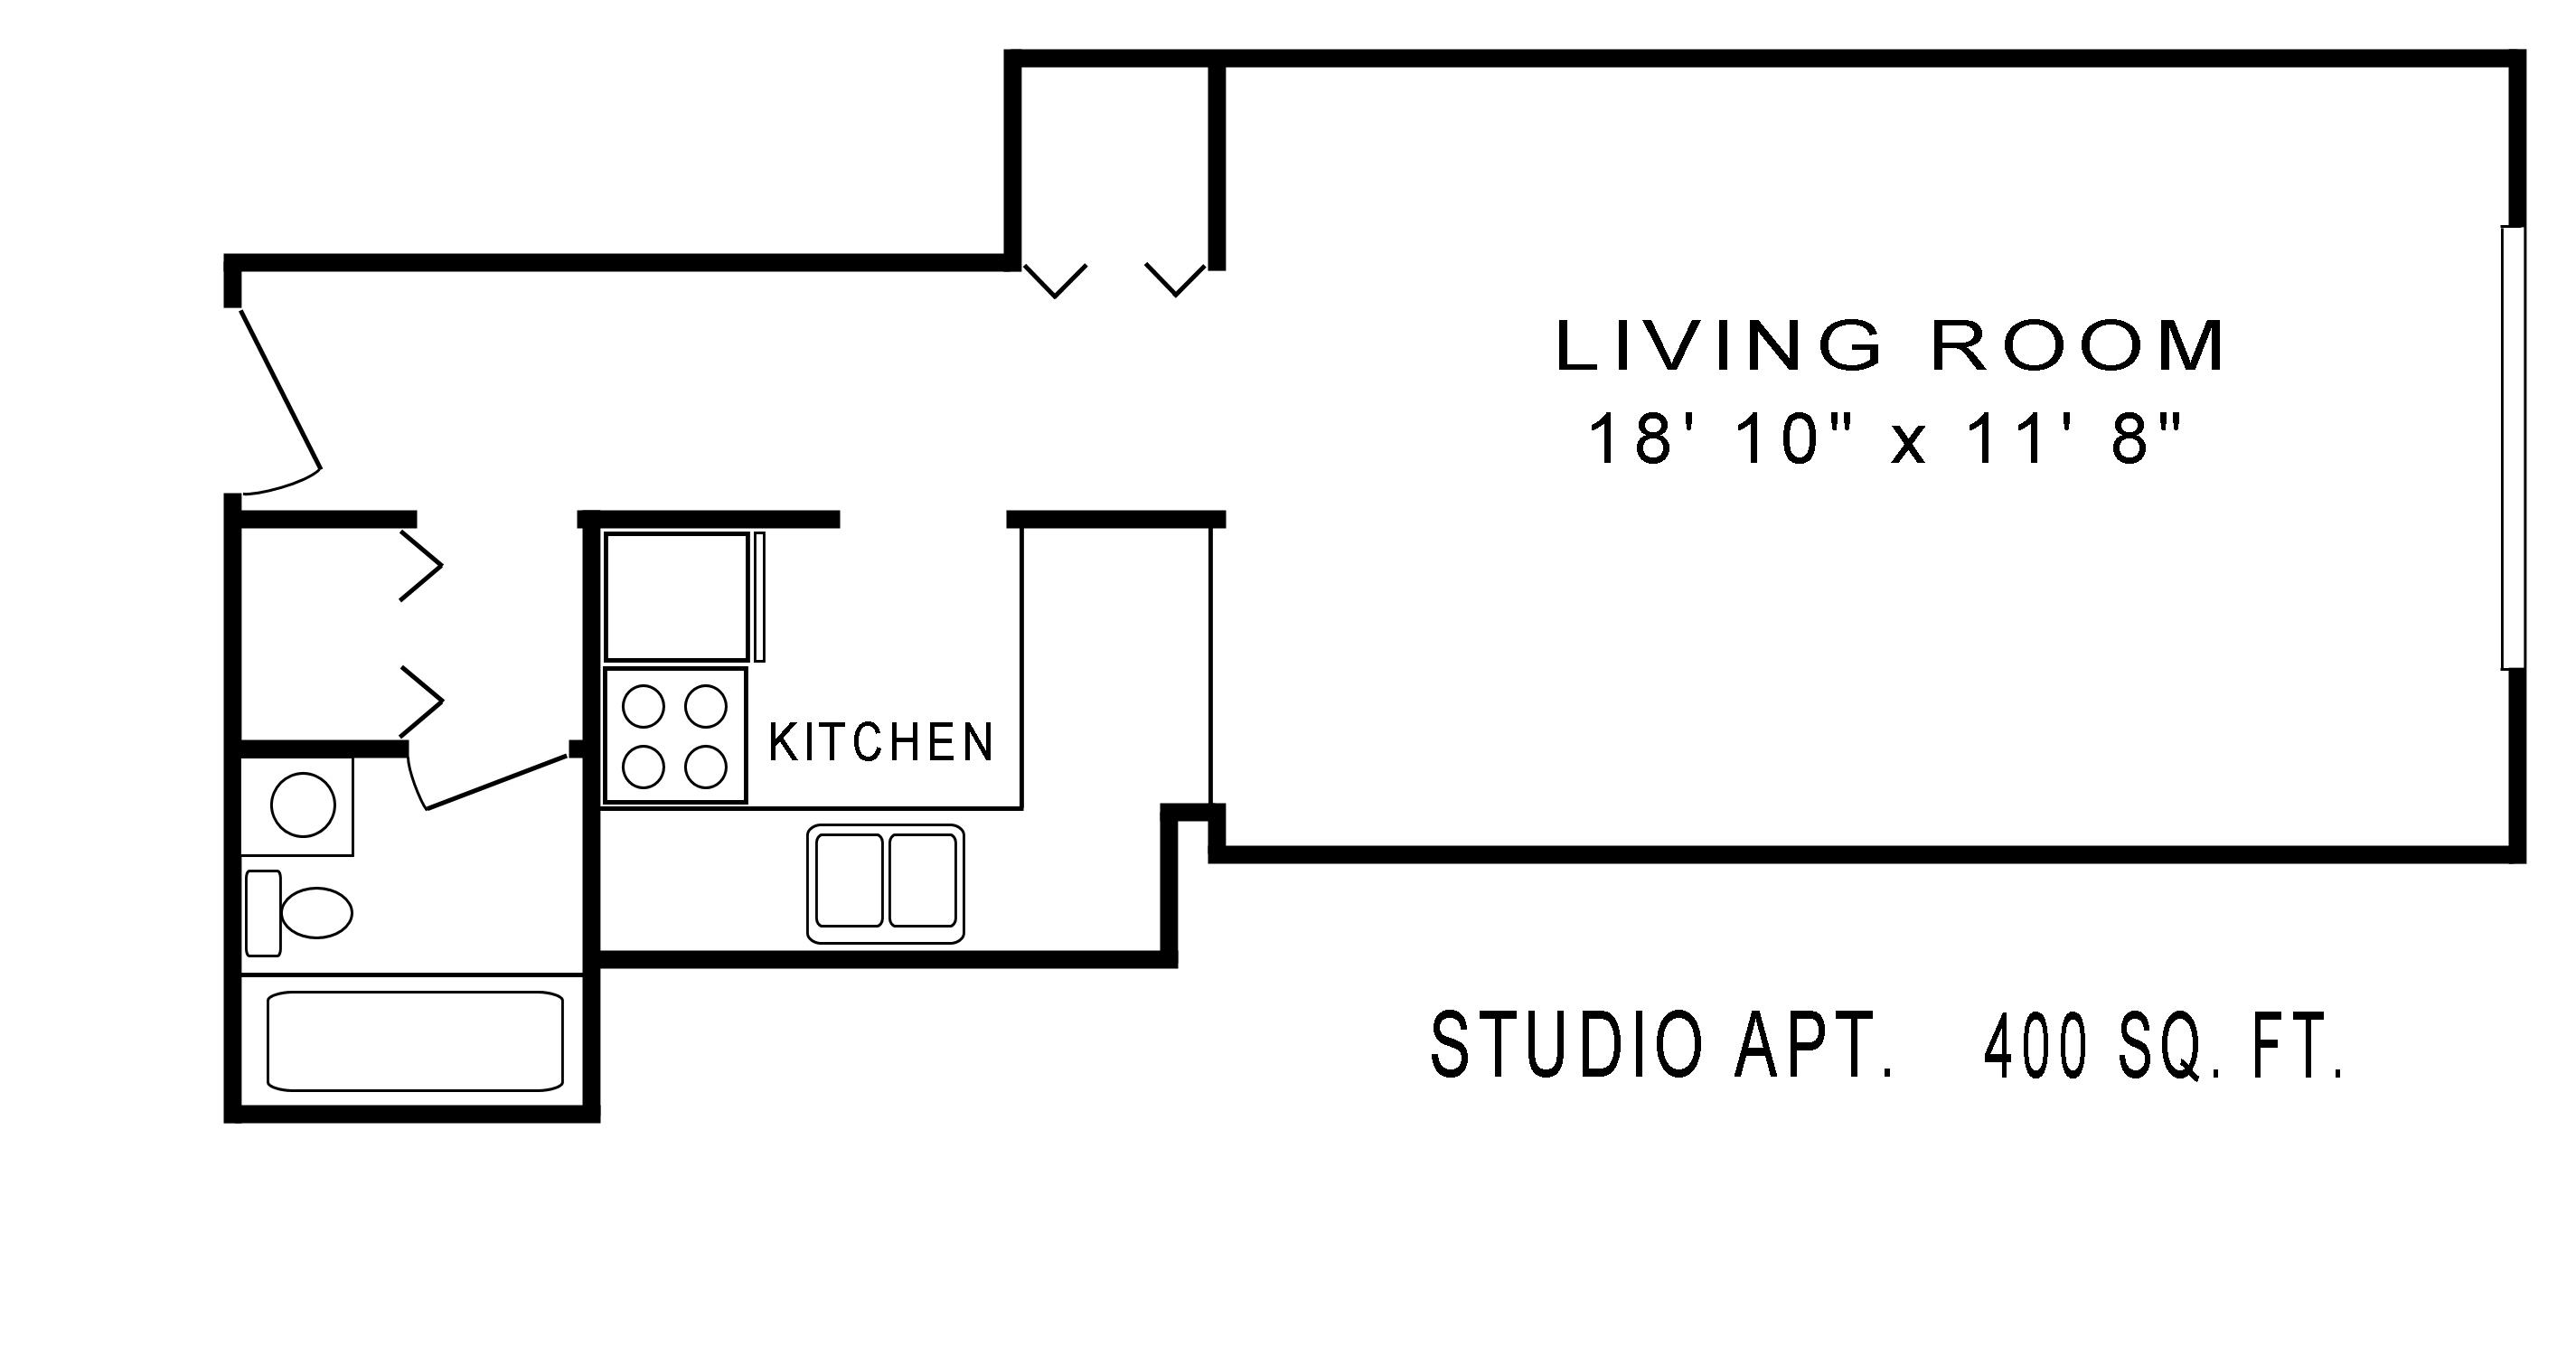 ucla housing floor plans - 28 images - ucla dorm room